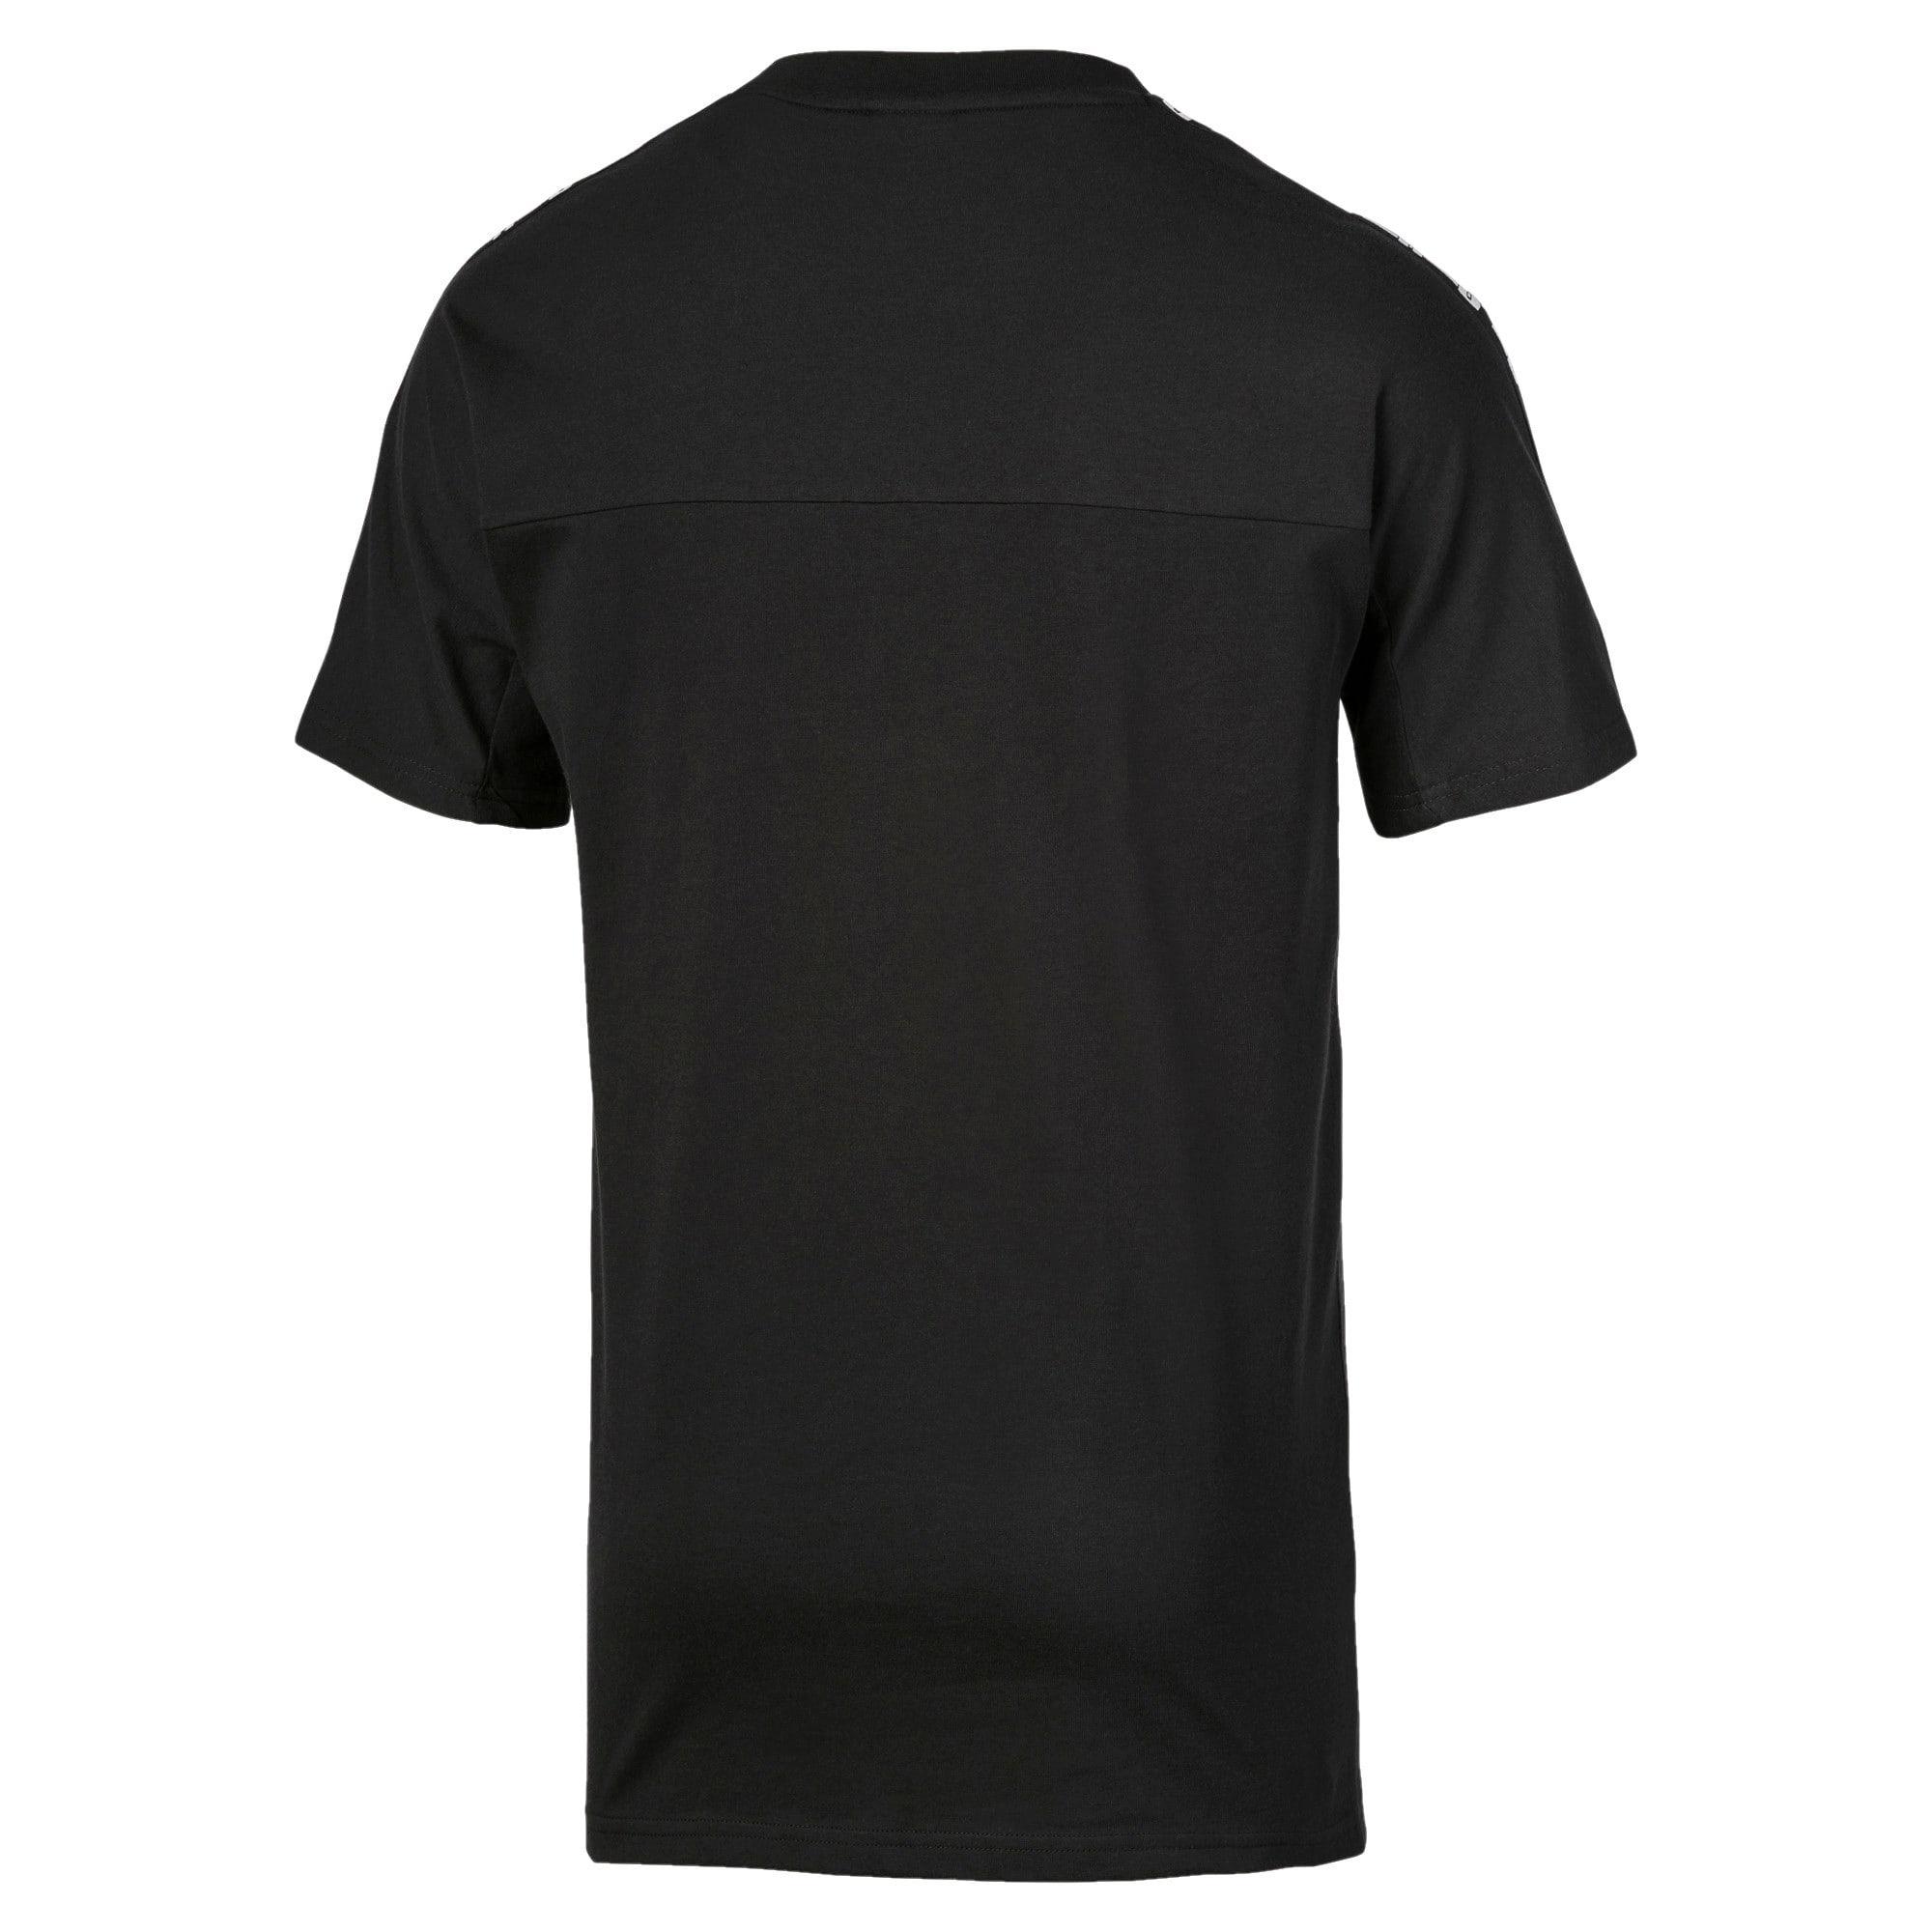 Thumbnail 6 of PUMA XTG SS Tシャツ, Puma Black, medium-JPN